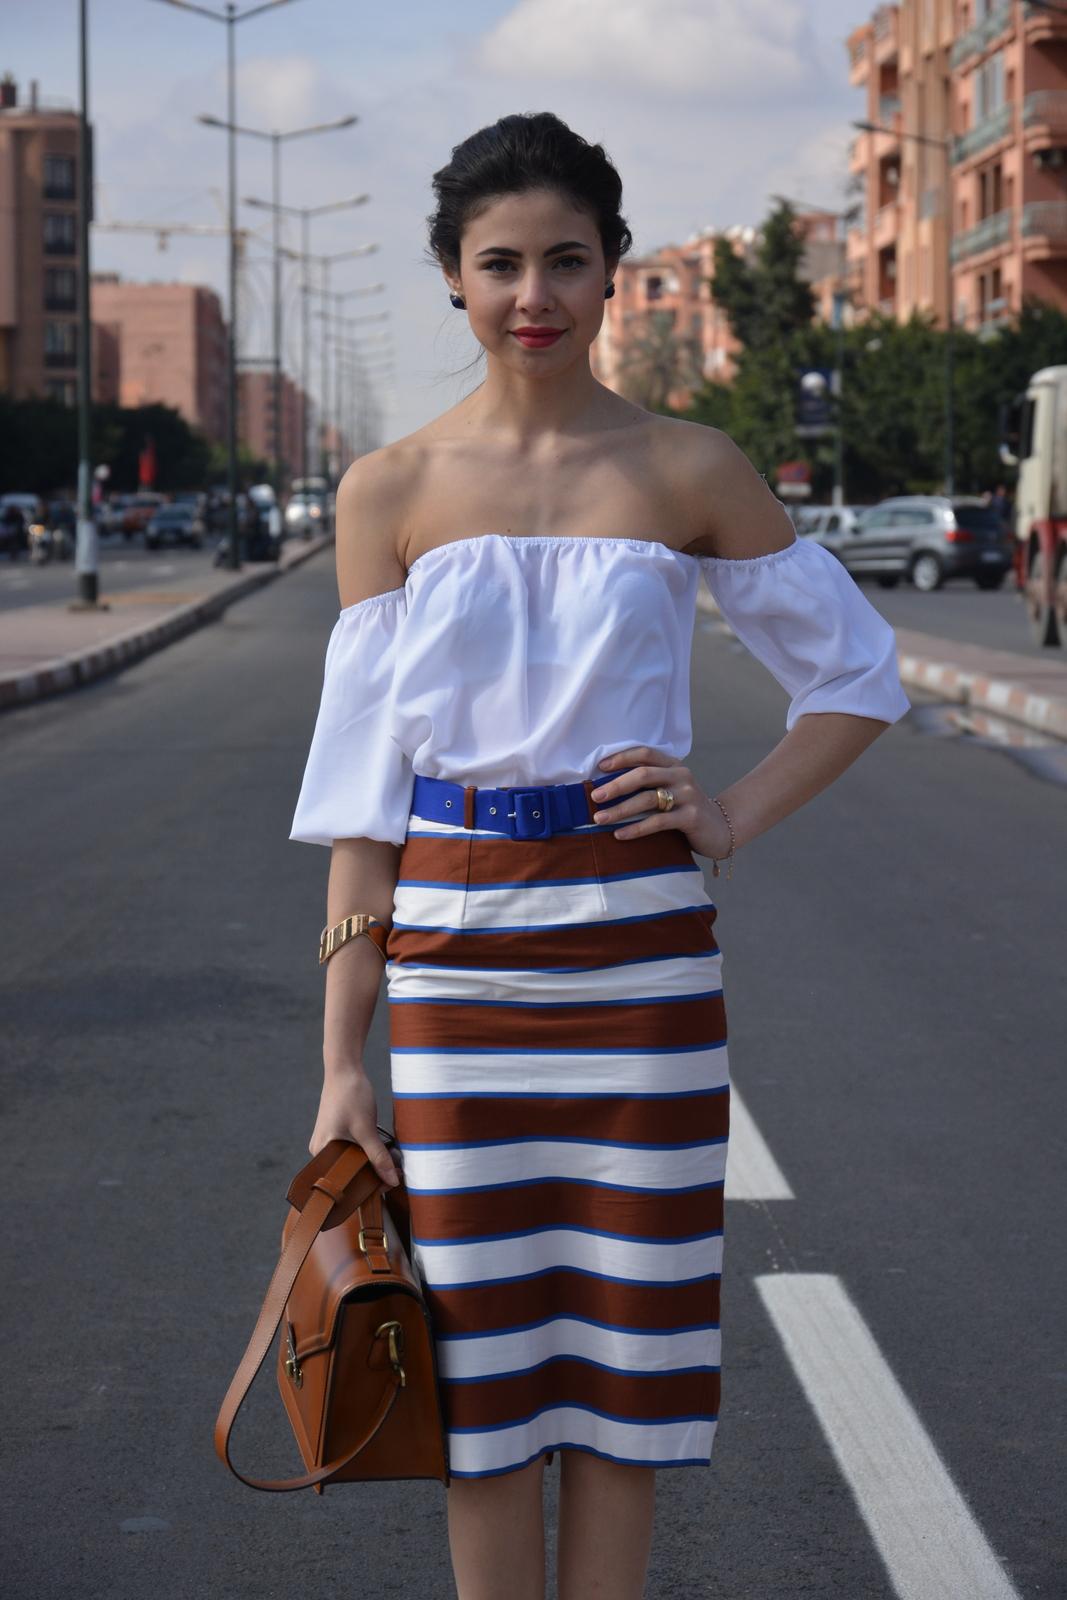 ootd, morocco, Marrakech, asos, johansen, bag, zara, bracelet, outfit, juliane borges, culture and trend, fashion blogger